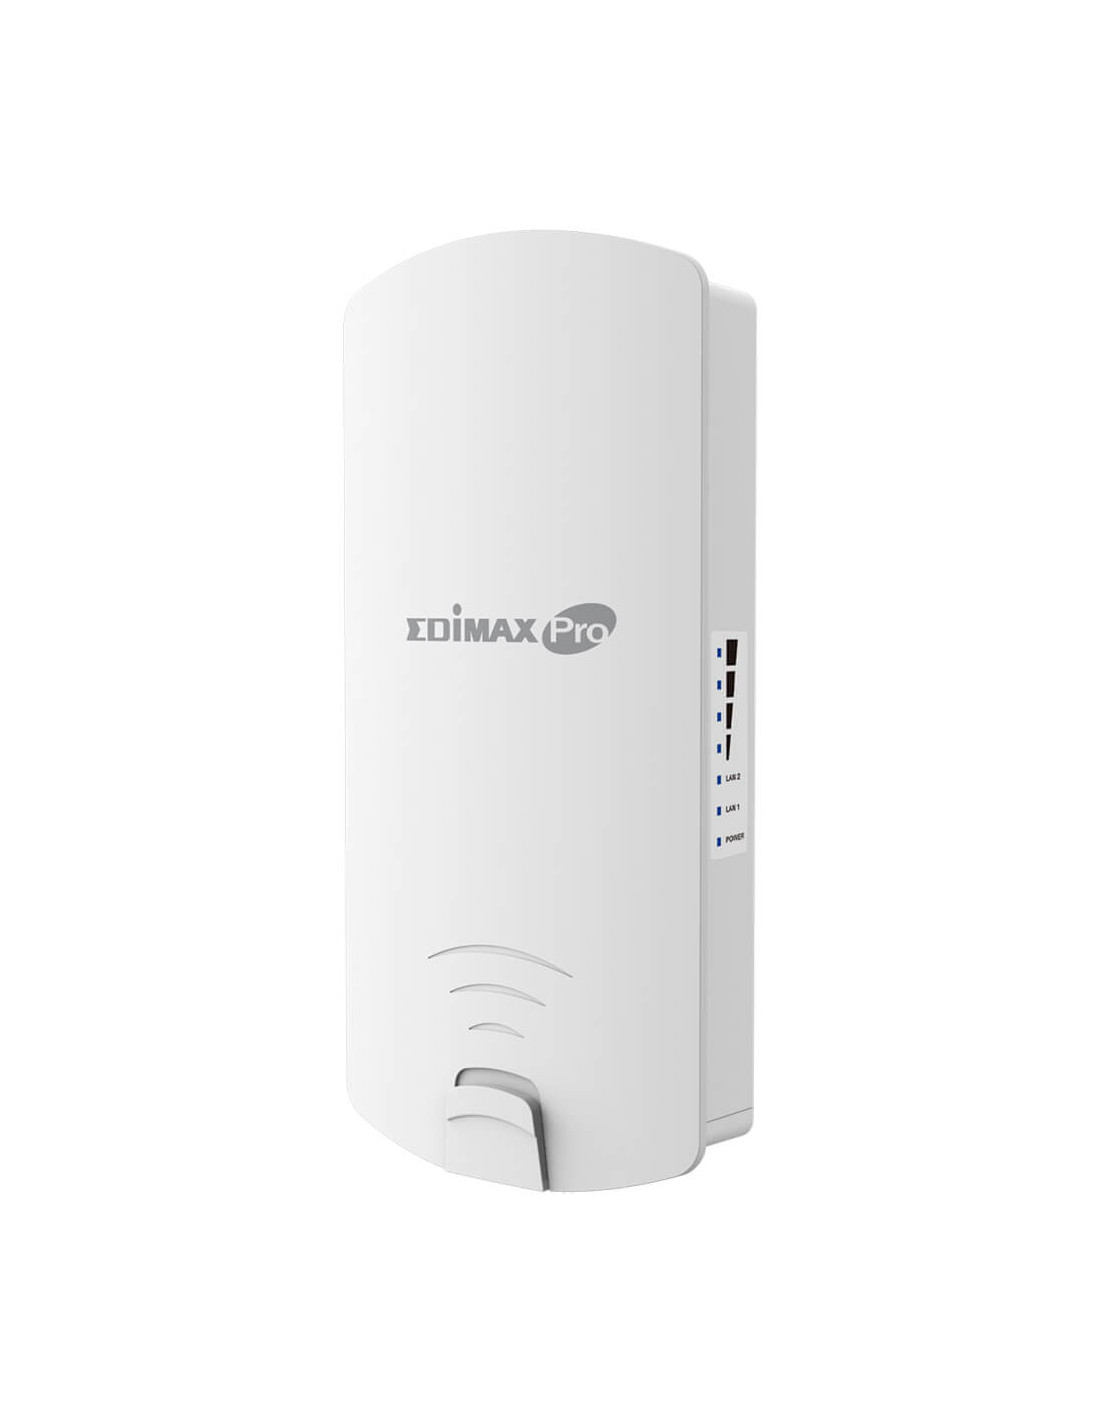 Edimax Pro Long Range 802.11ac 2T2R 5Ghz Outdoor Access Point